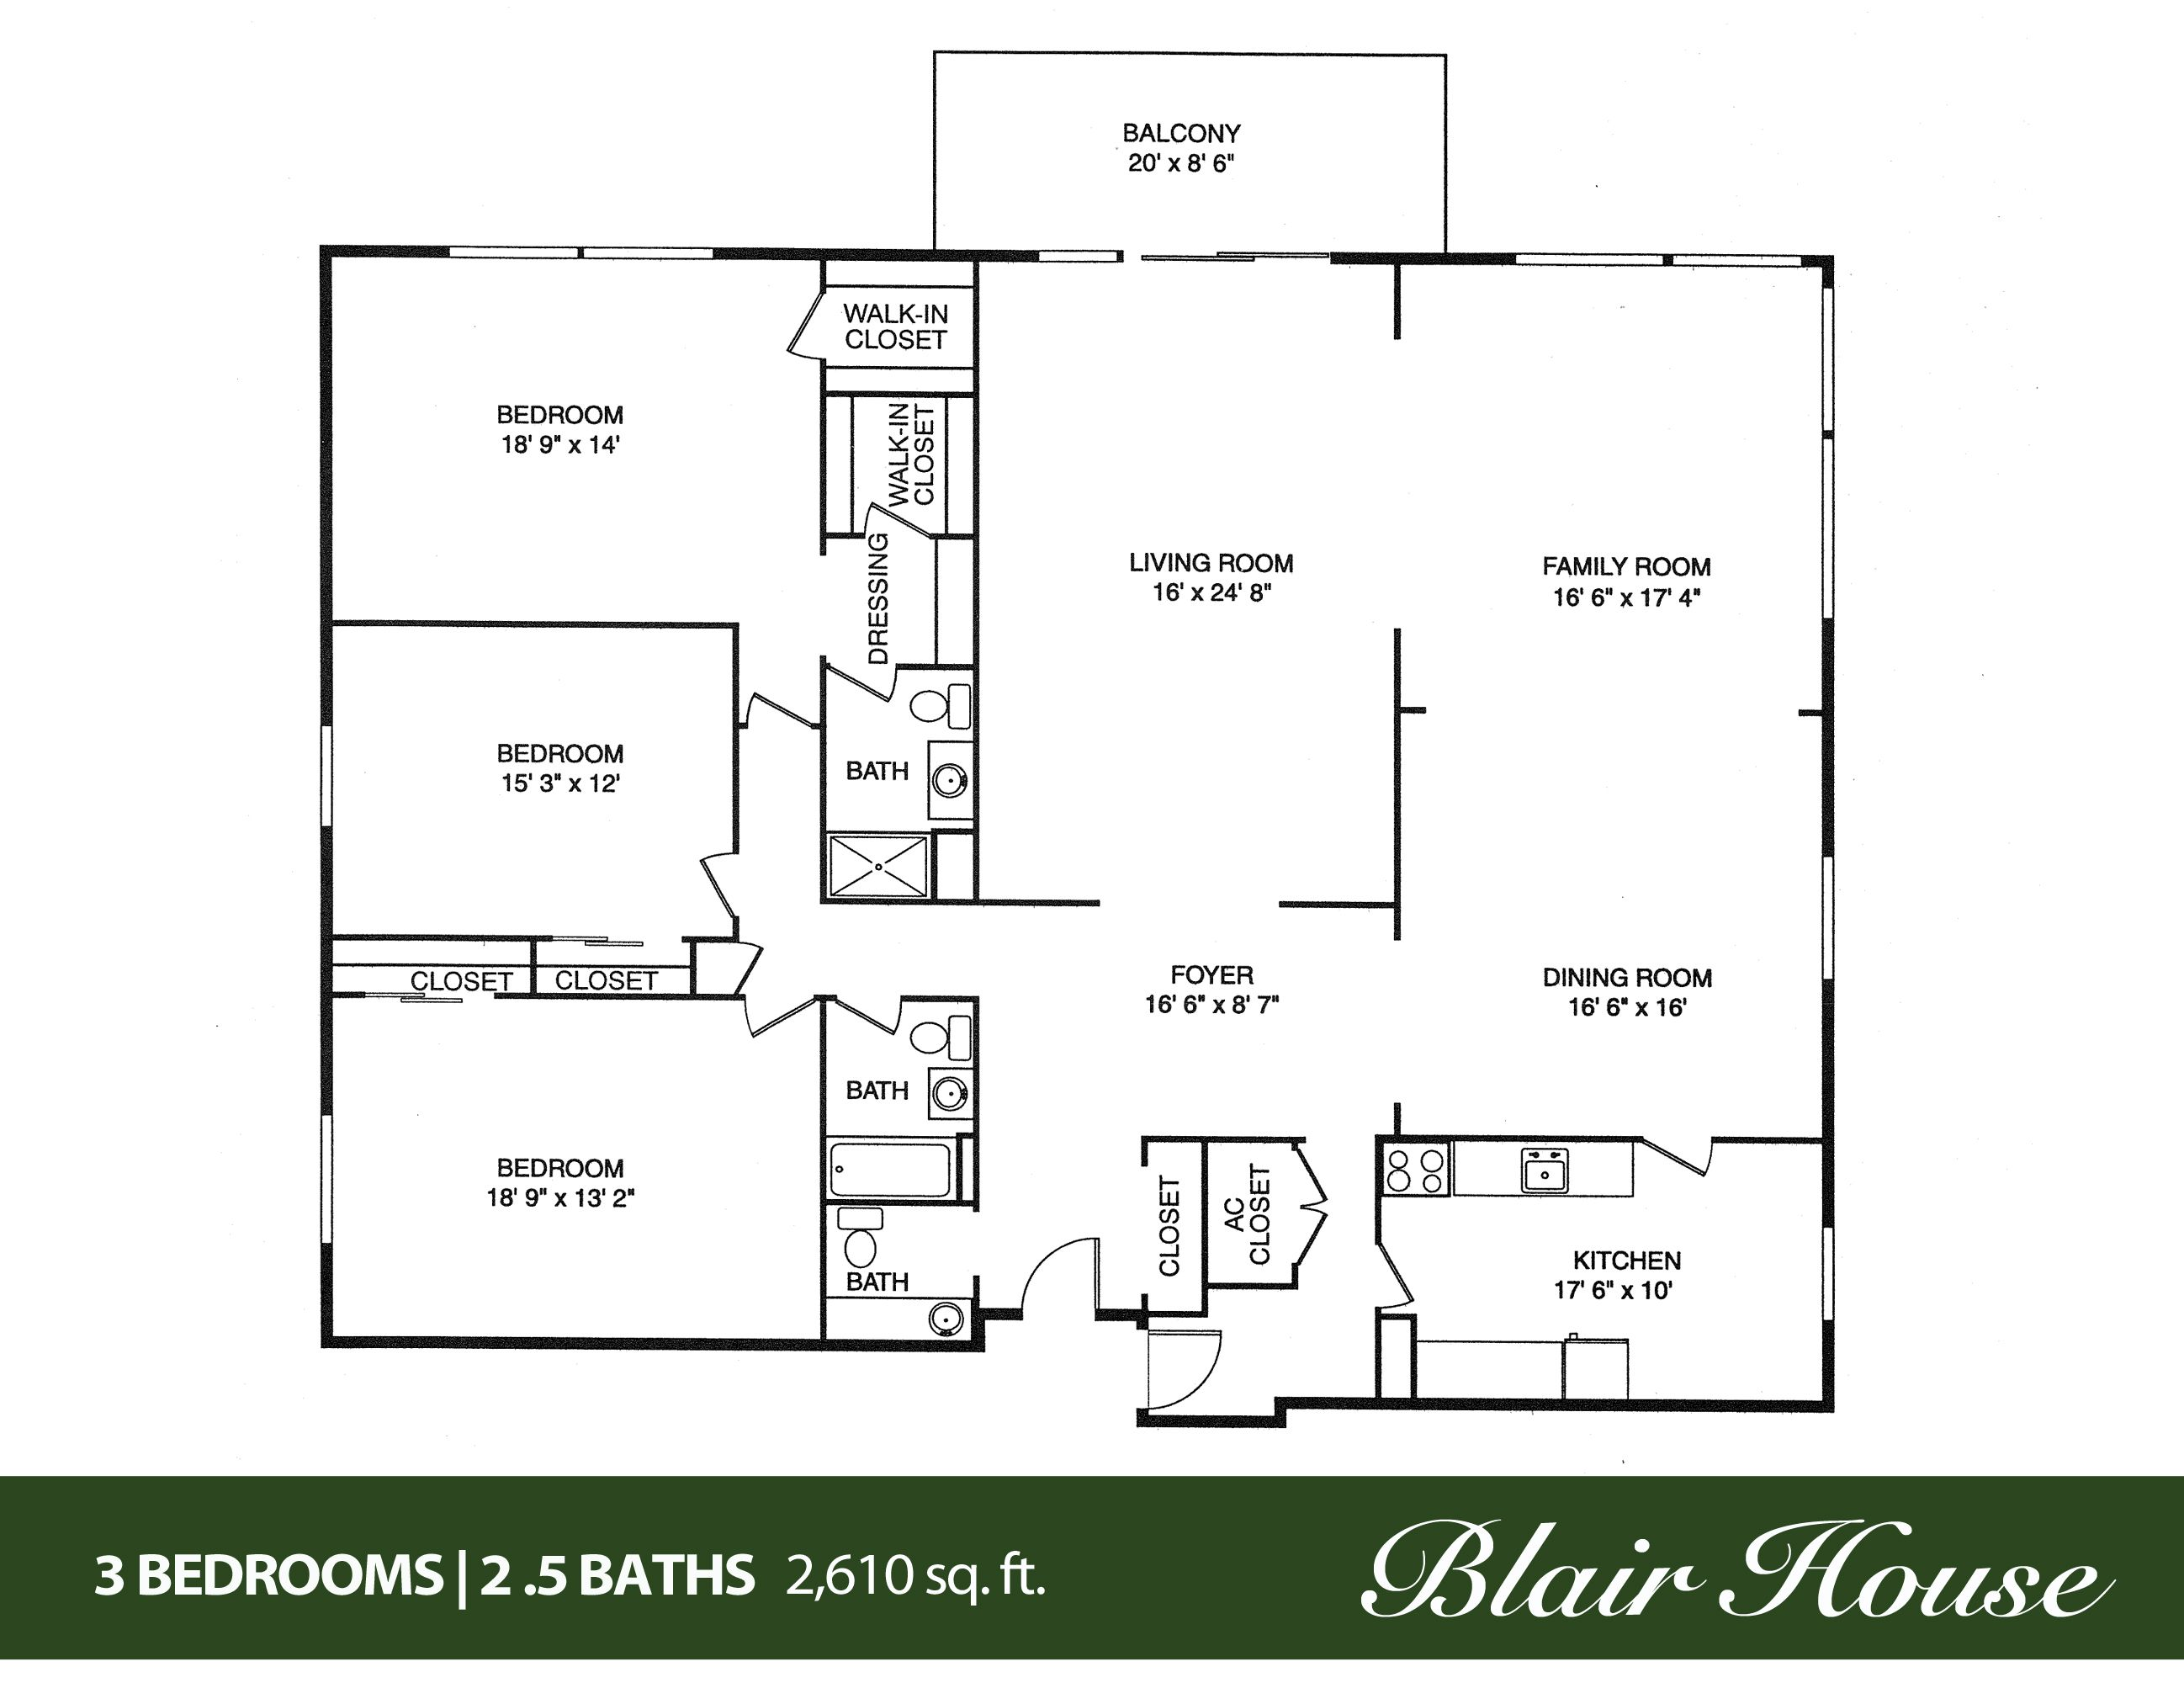 c6641ad7842f18ae64e6cf41dc3129fe four bed two bath house plans house plans 2017,4 Bedroom 2 Bath House Plans